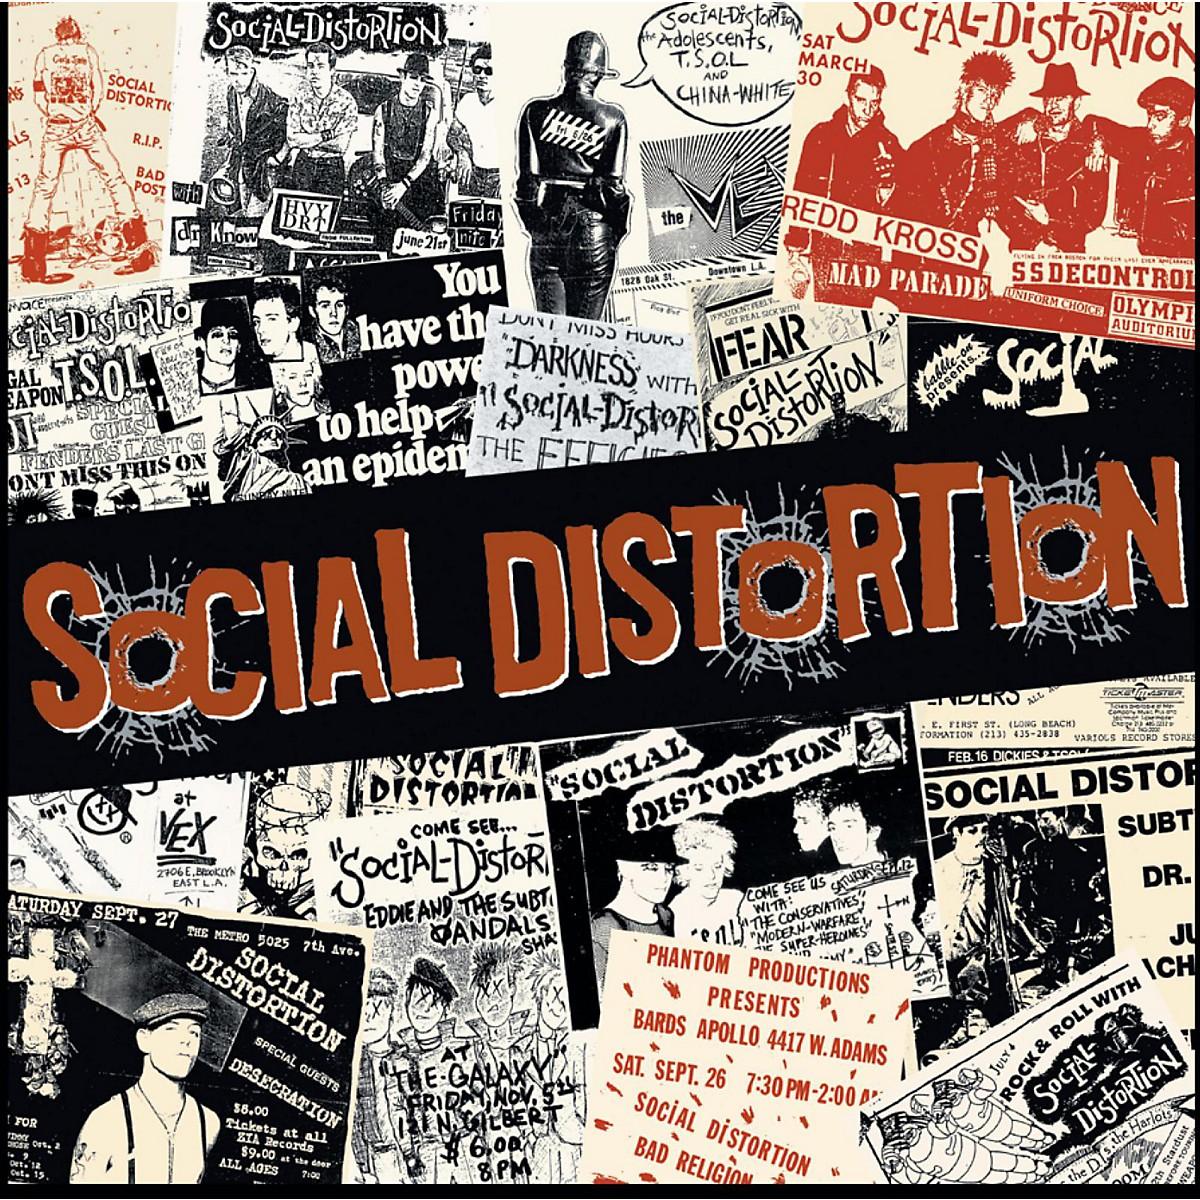 C&D Visionary Social Distortion Magnet - Newspaper